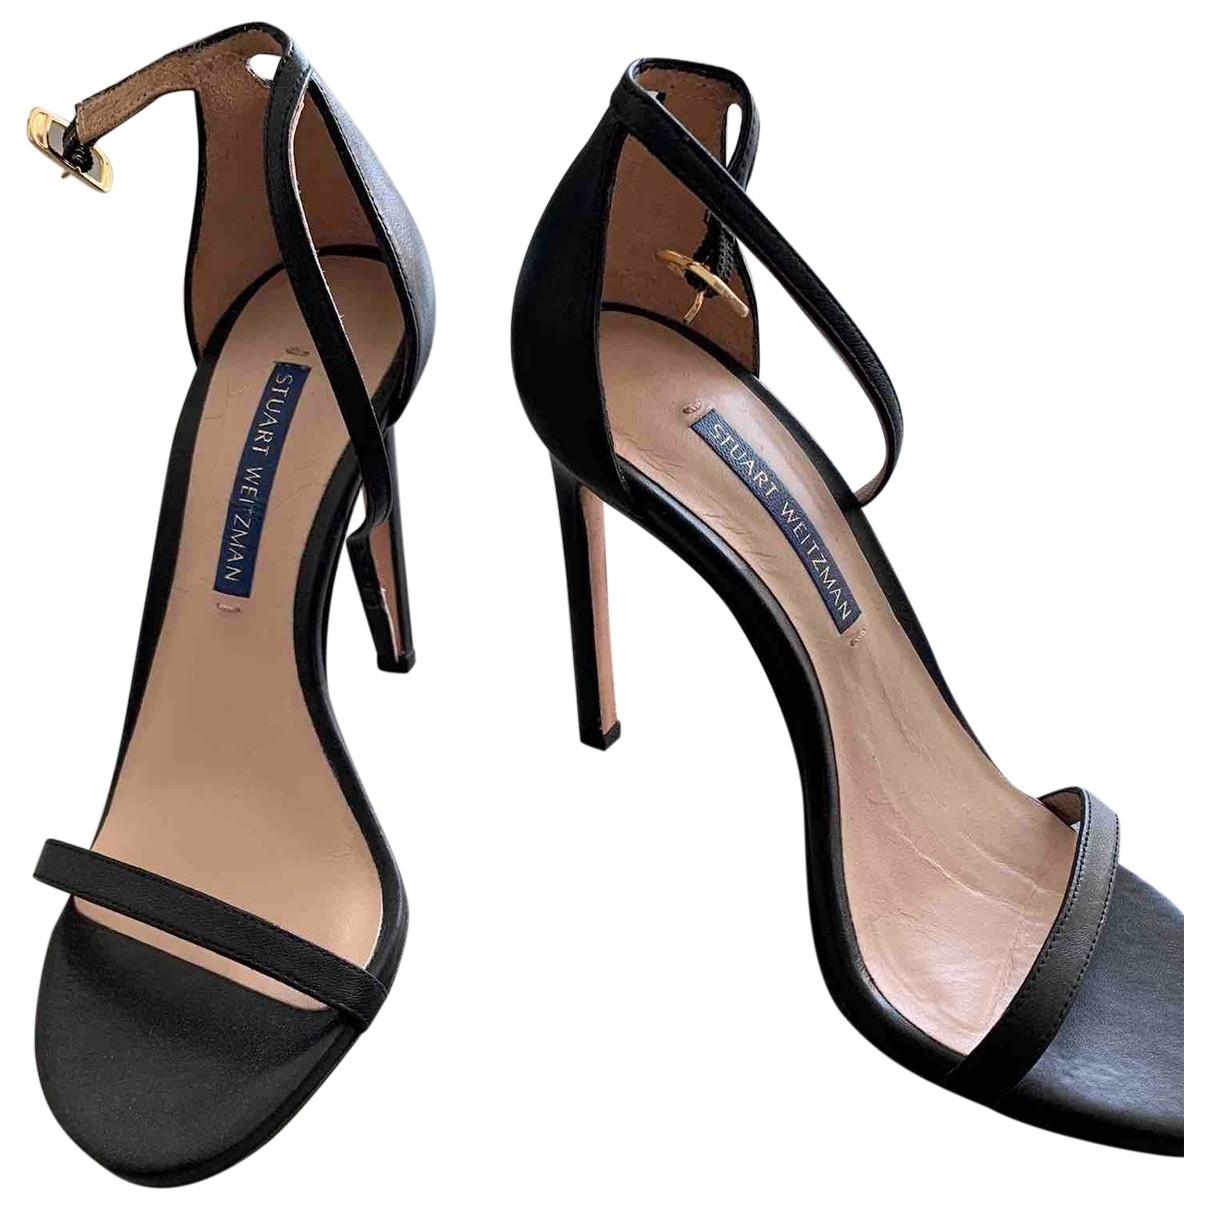 Stuart Weitzman \N Black Leather Sandals for Women 35 EU